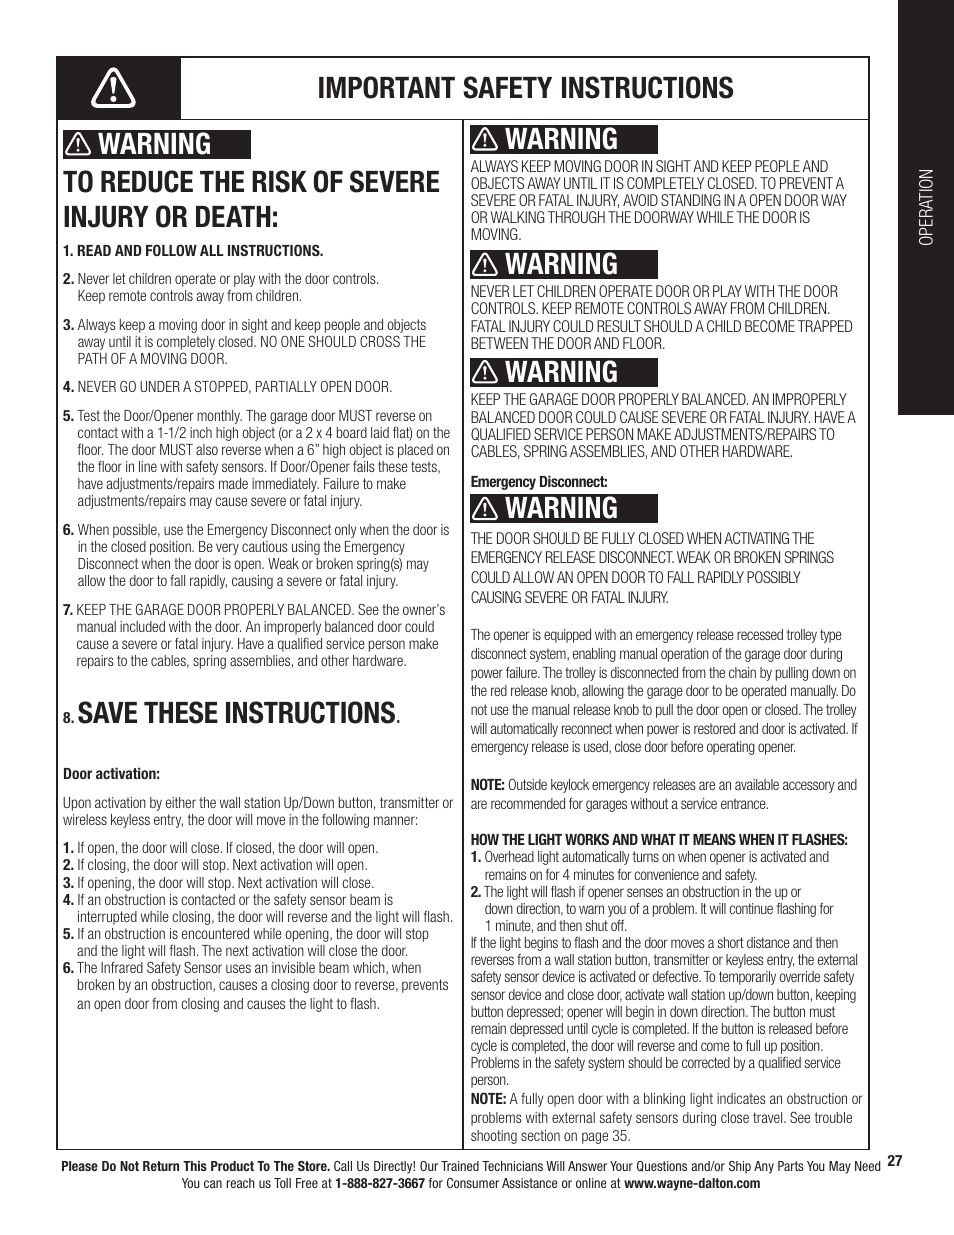 save these instructions warning wayne dalton prodrive 3222c z rh manualsdir com wayne dalton 3212 owners manual Wayne Dalton Garage Door Openers